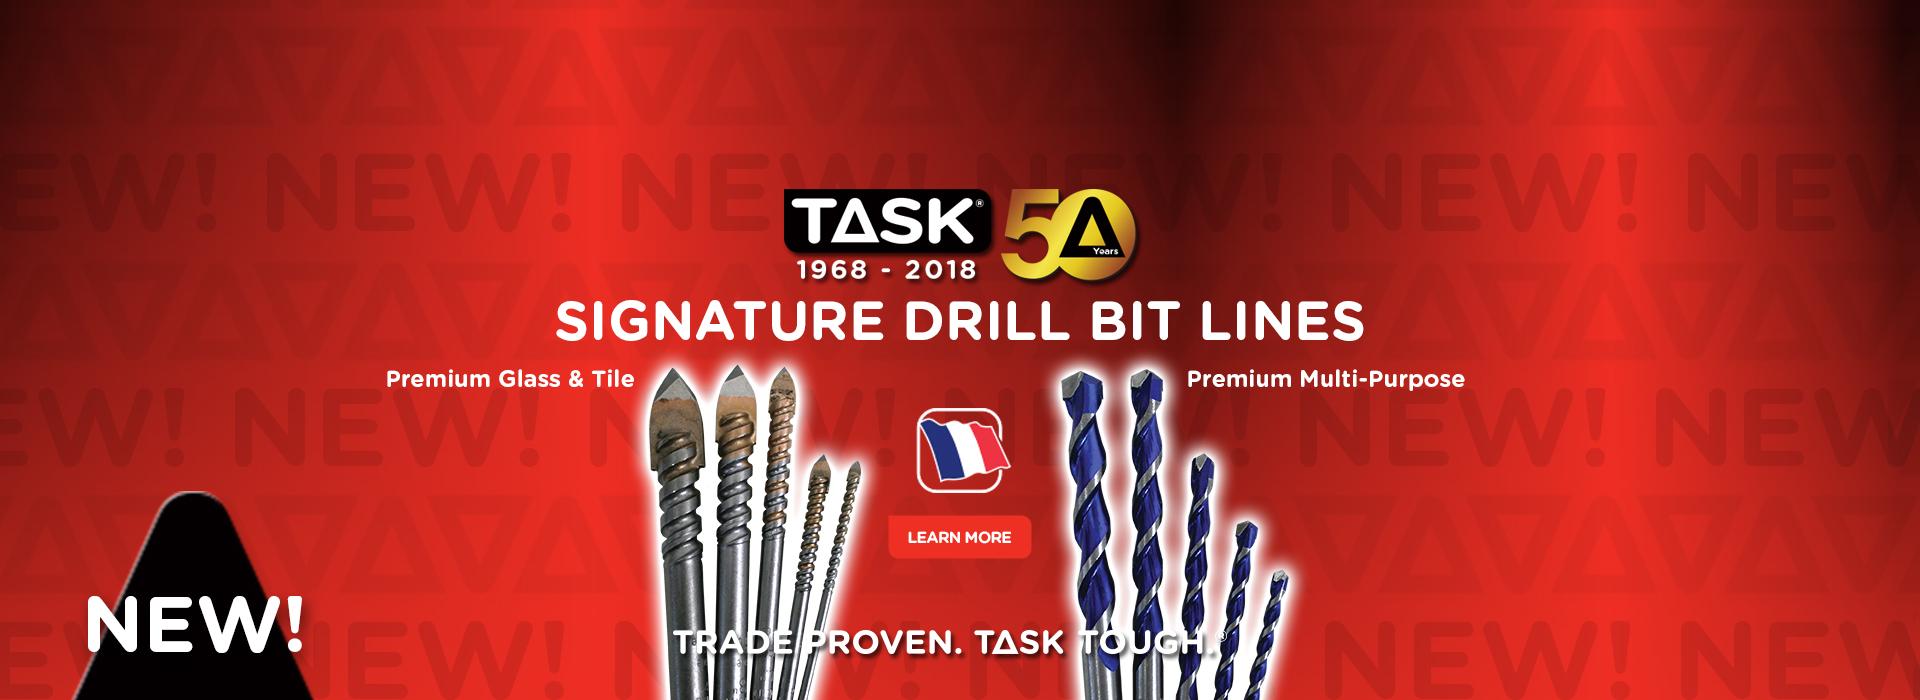 Premium Glass Tile & Multipurpose Drill Bits